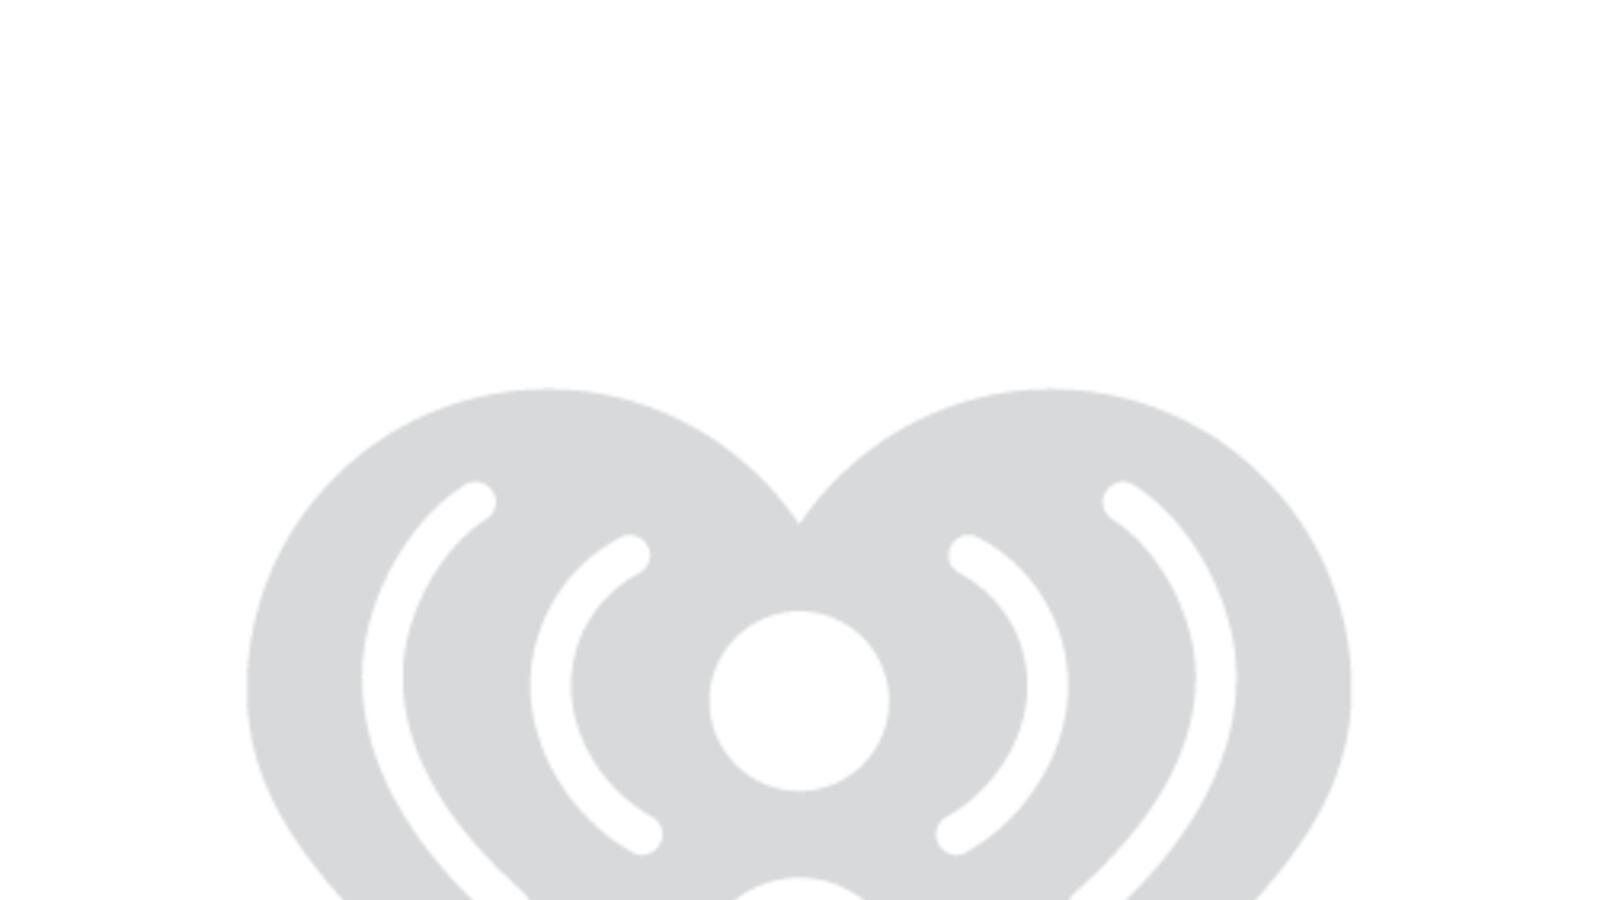 Swizz Beatz Reveals DMX's Final Album Concepts, The Future Of Verzuz + More